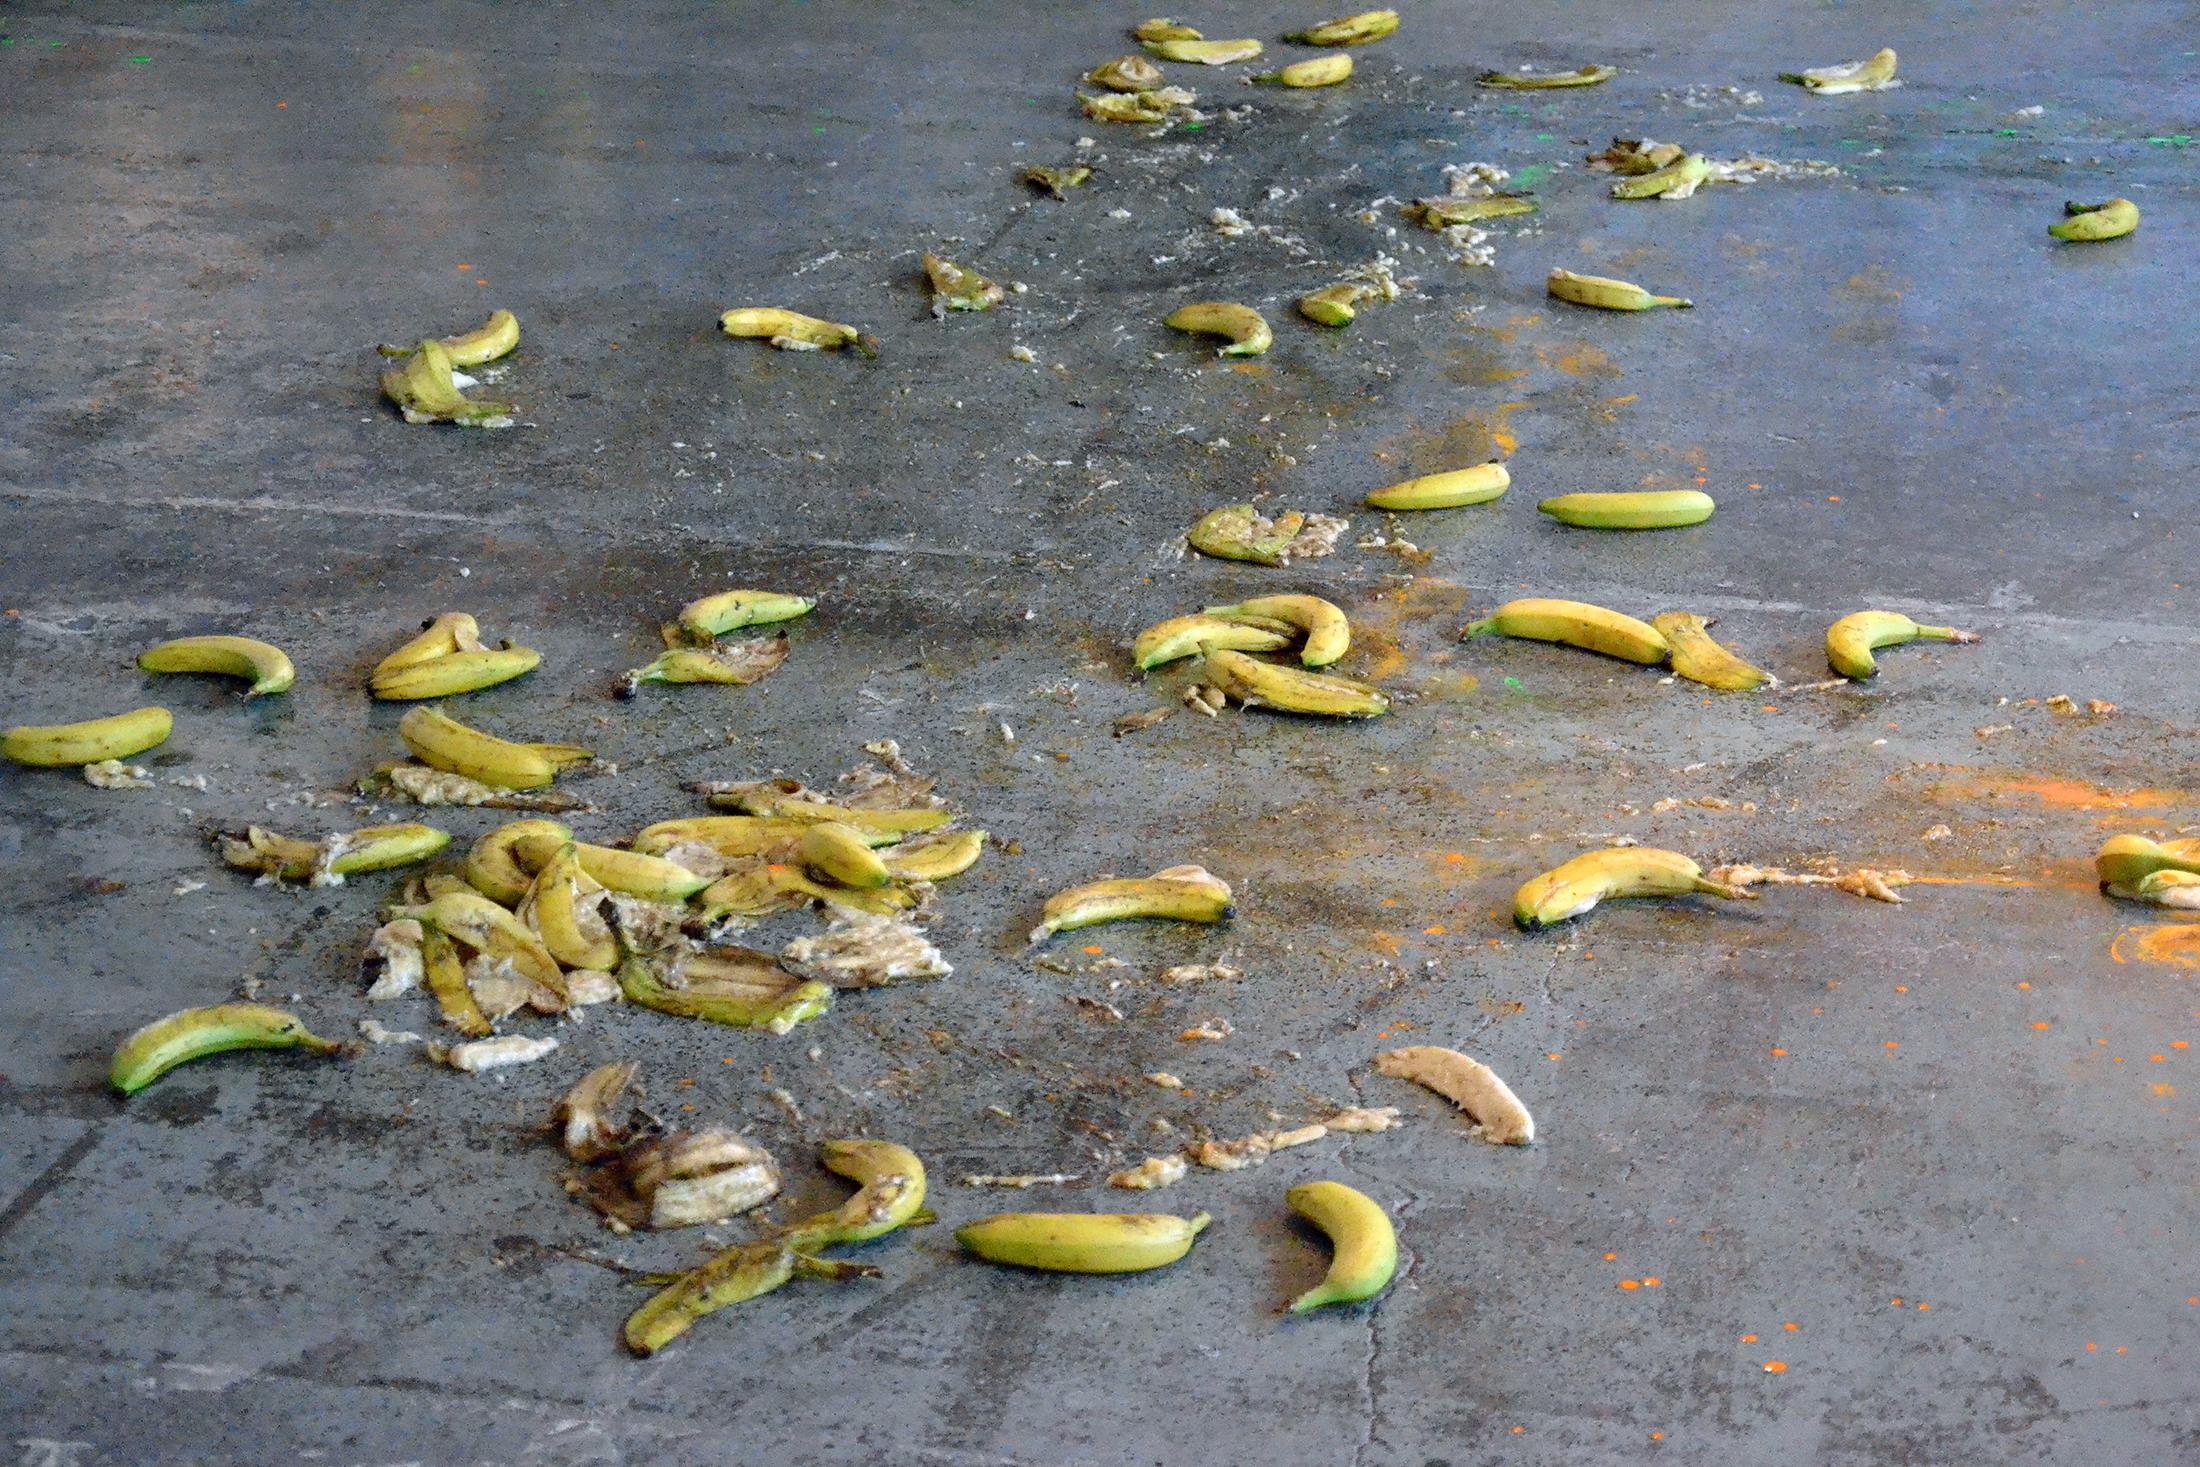 Loads of bananas squashed on the floor, slippery, cartoony